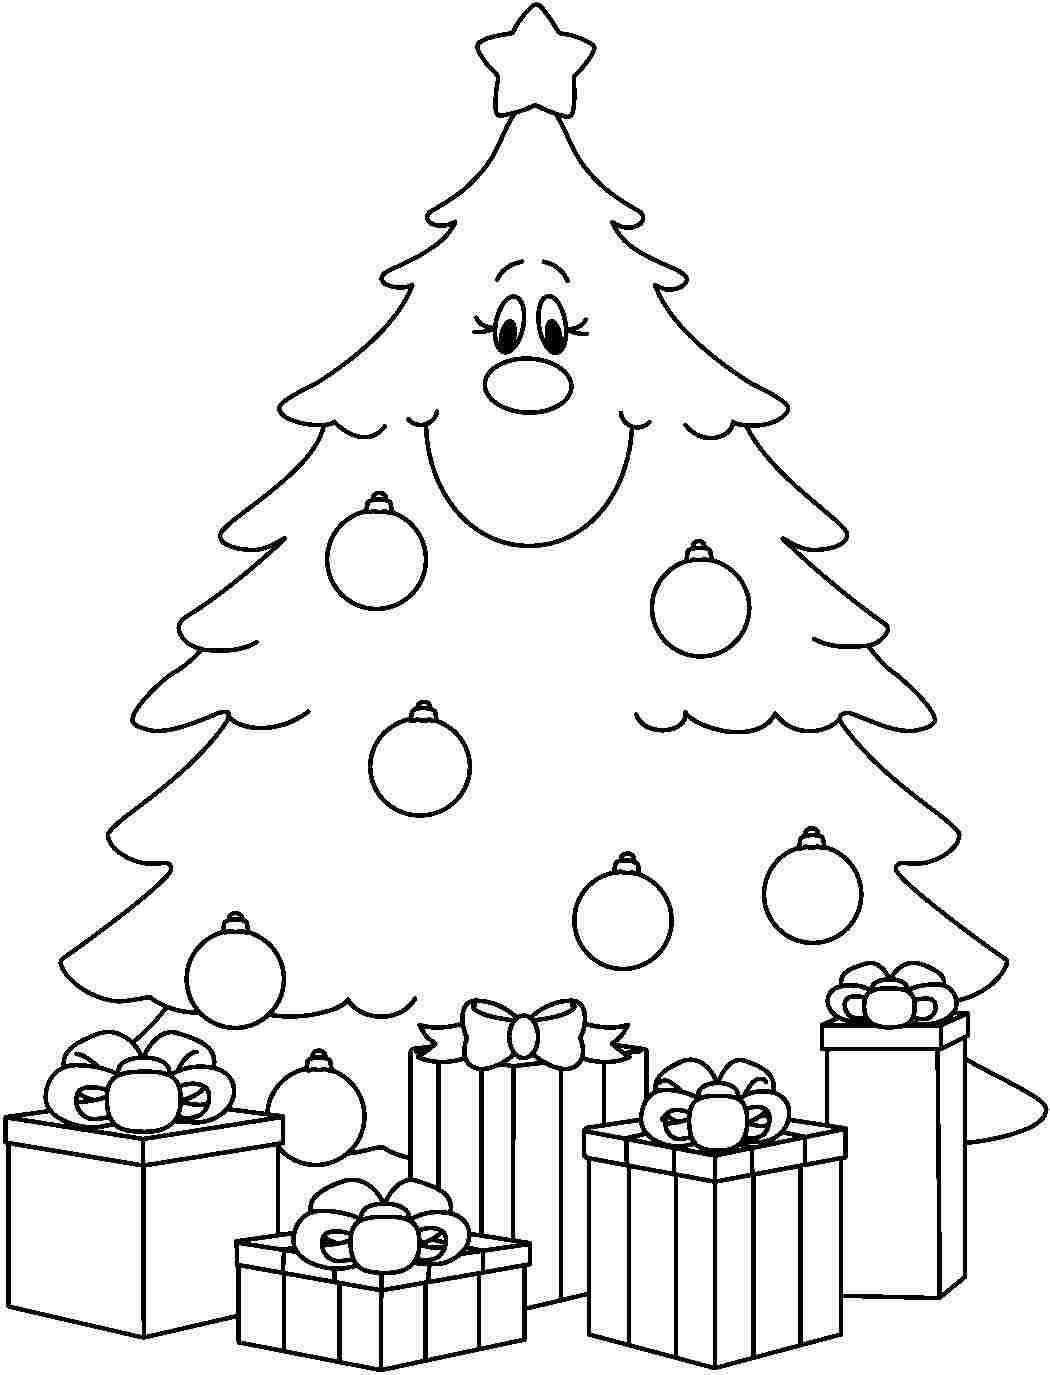 Easy Drawings For Kids Christmas Tree